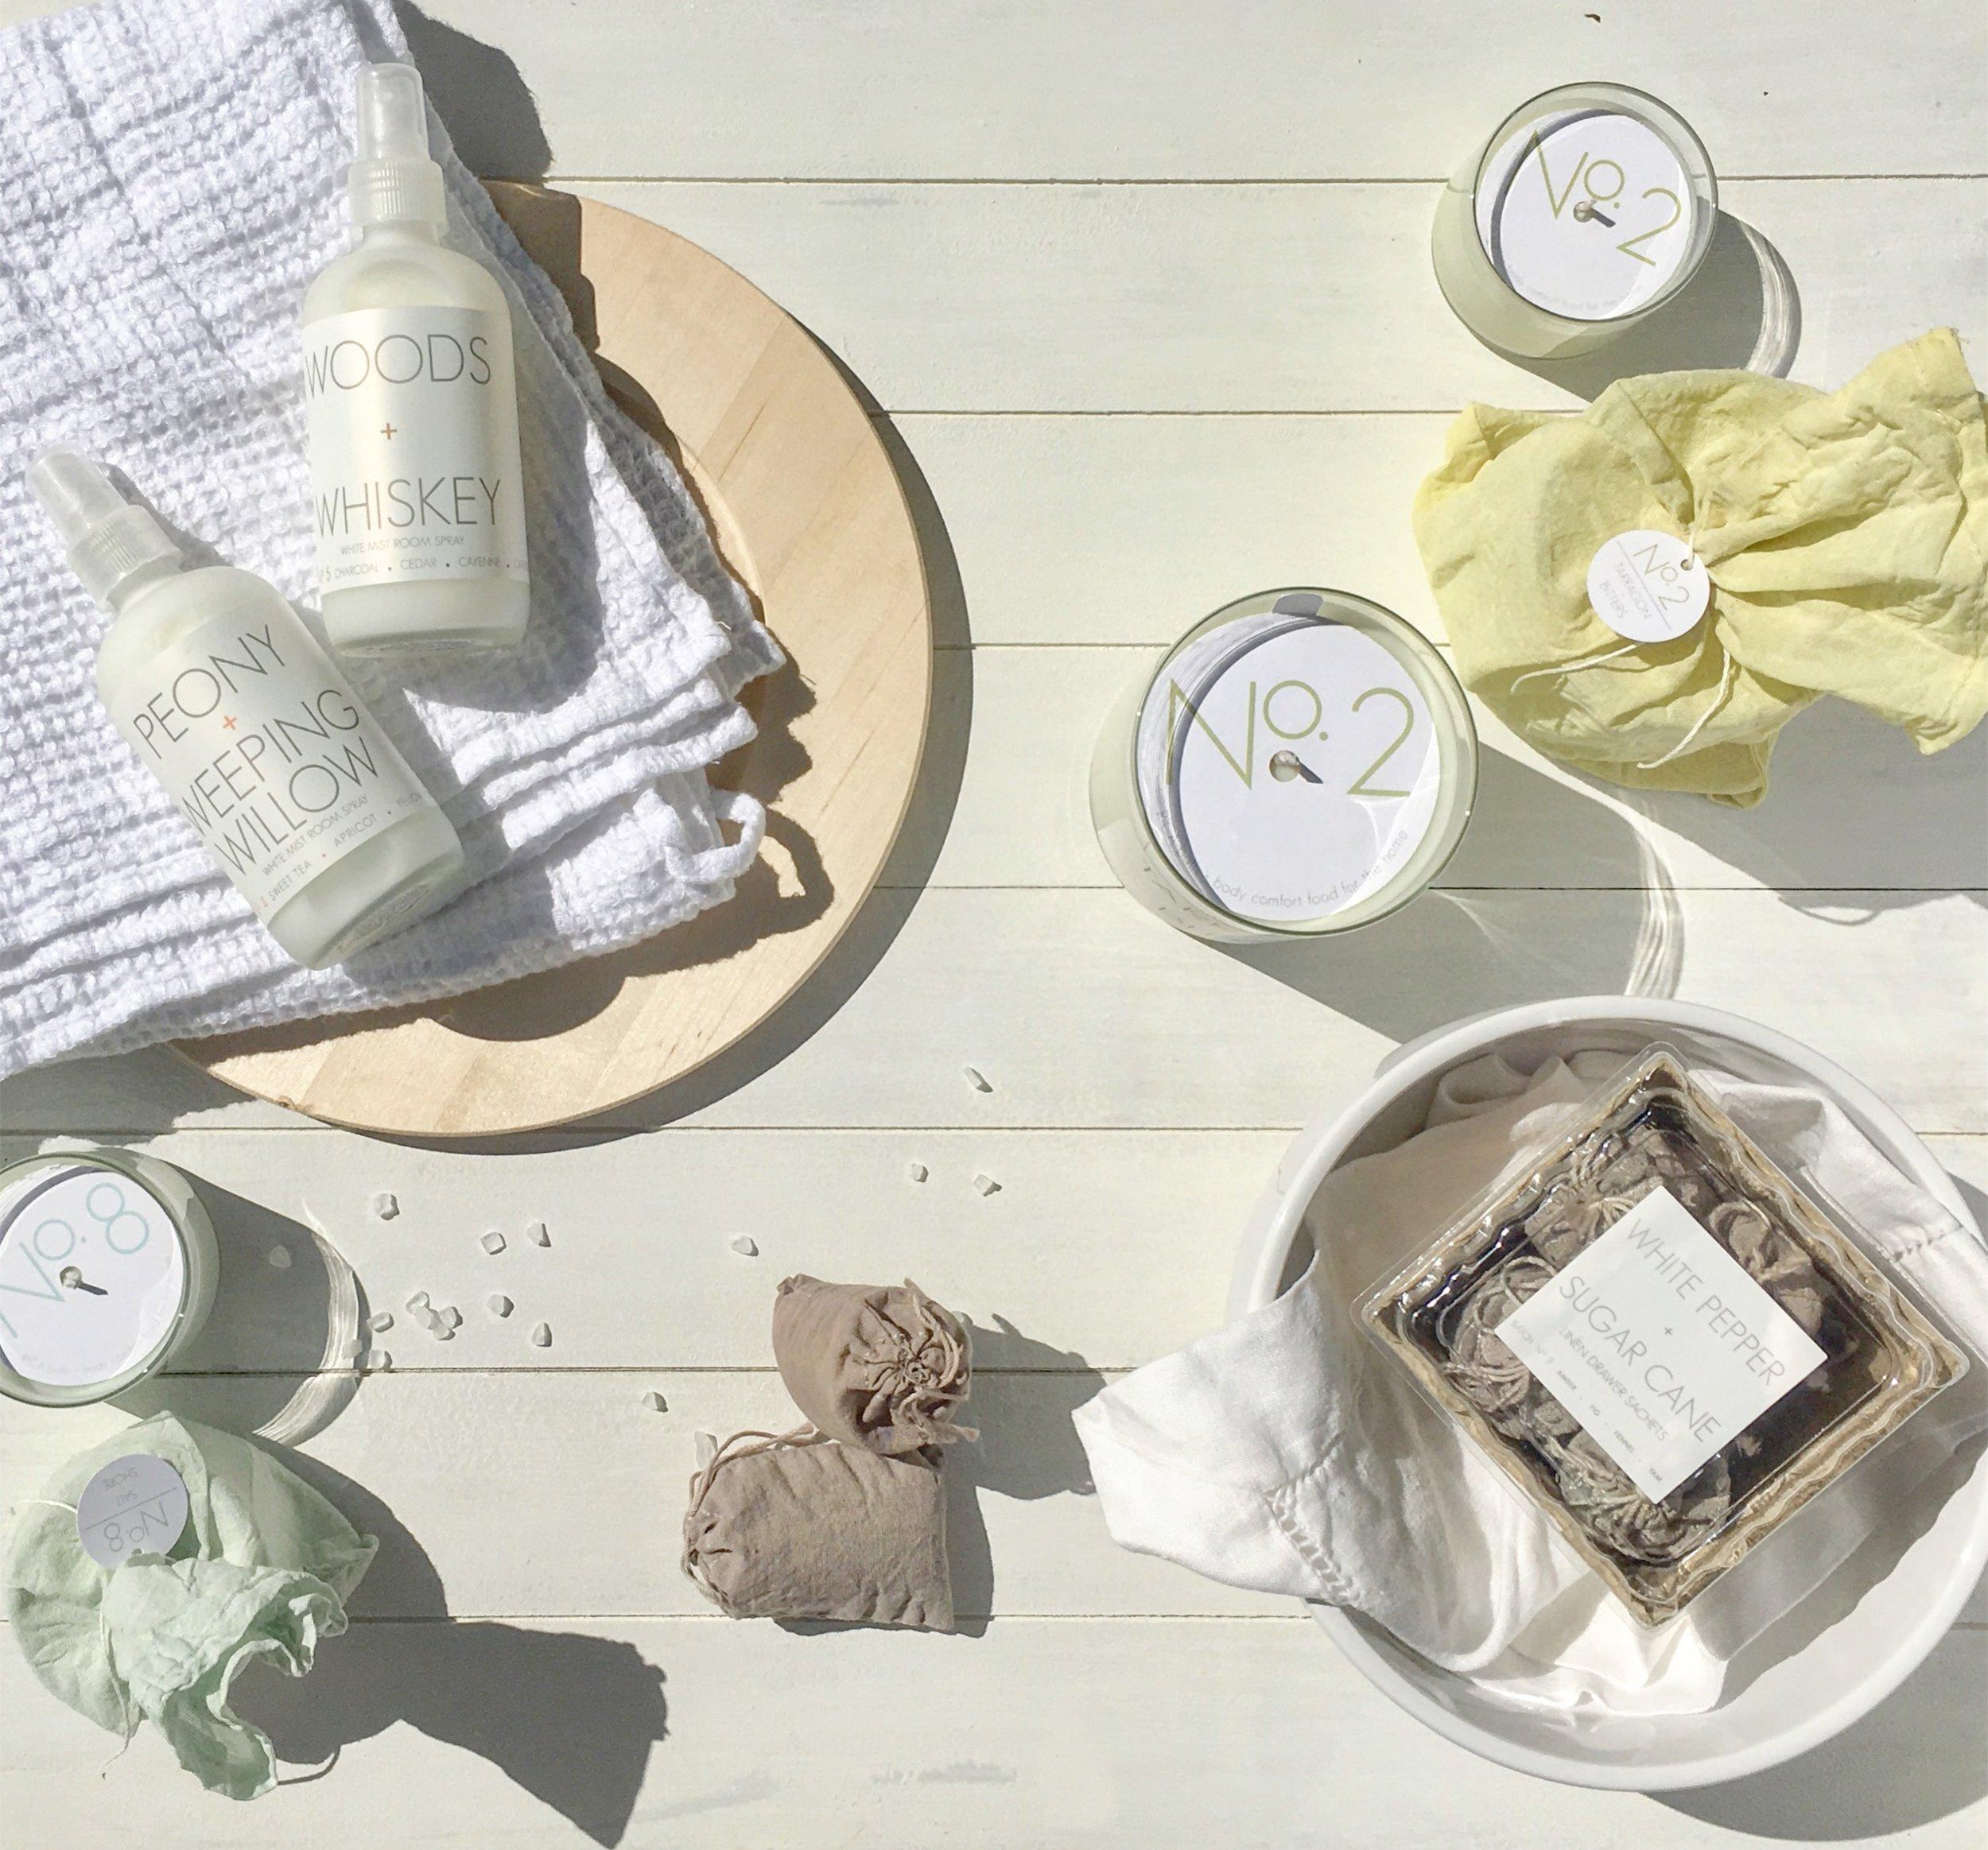 RICA bath + body Summer Sun Sprays on Wooden Plate Sachets in Ceramic Bowl Candles.JPG